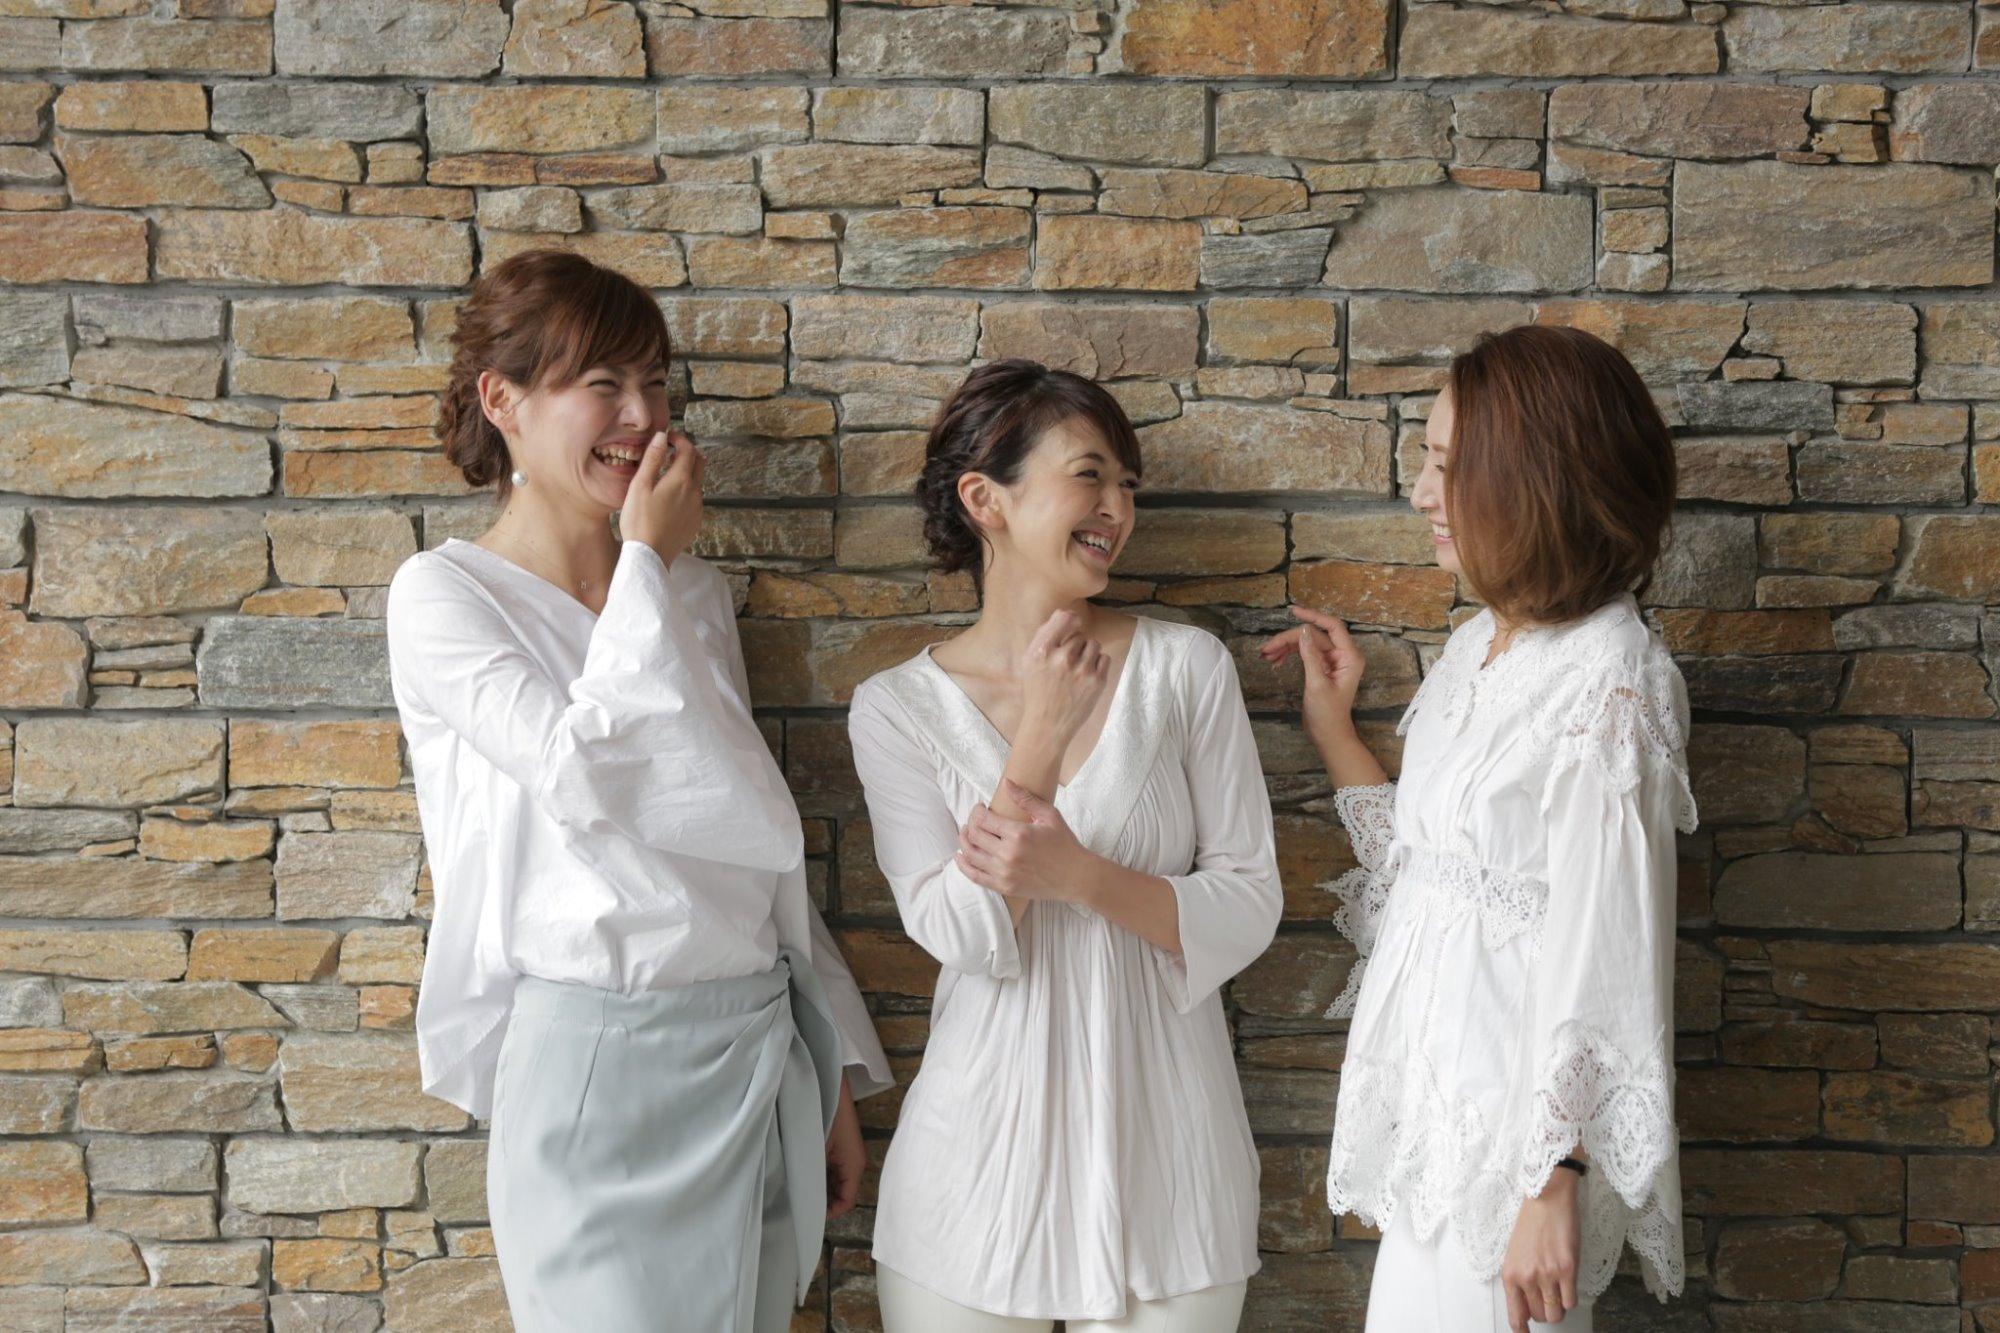 【HDC大阪 くらし向上計画】~言葉遣いは心遣い~相手を想う話し方美人セミナー